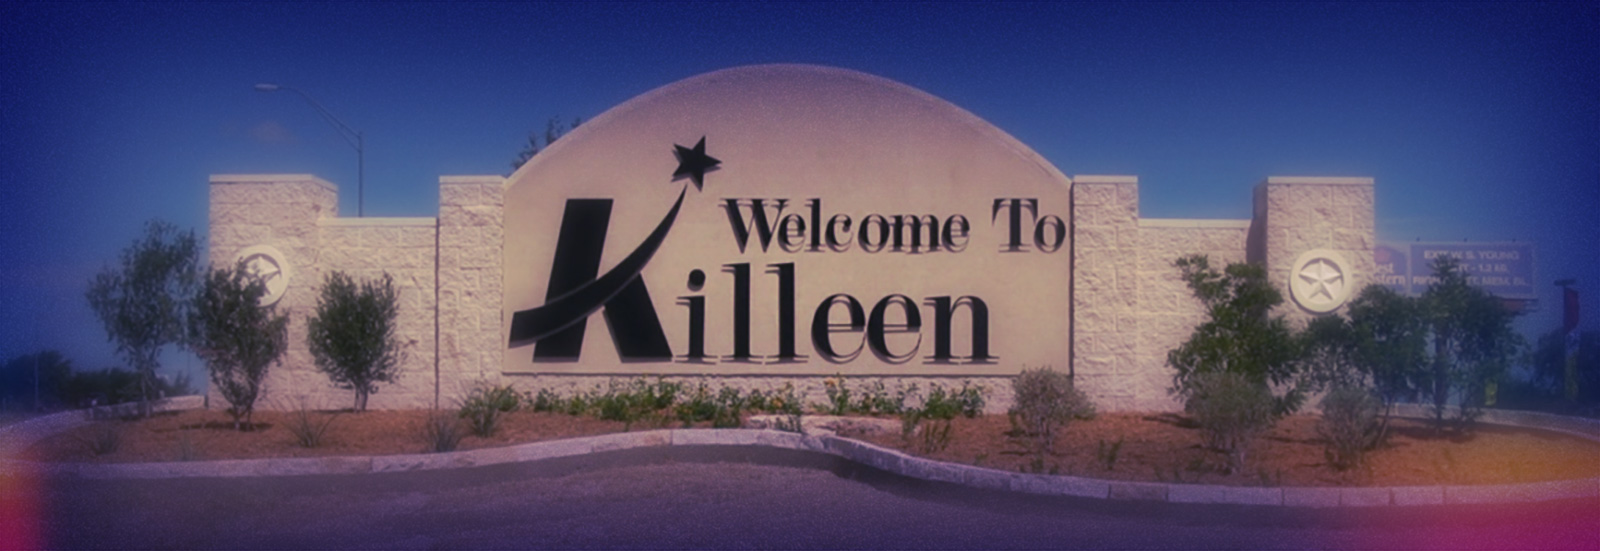 Killeen-Sign